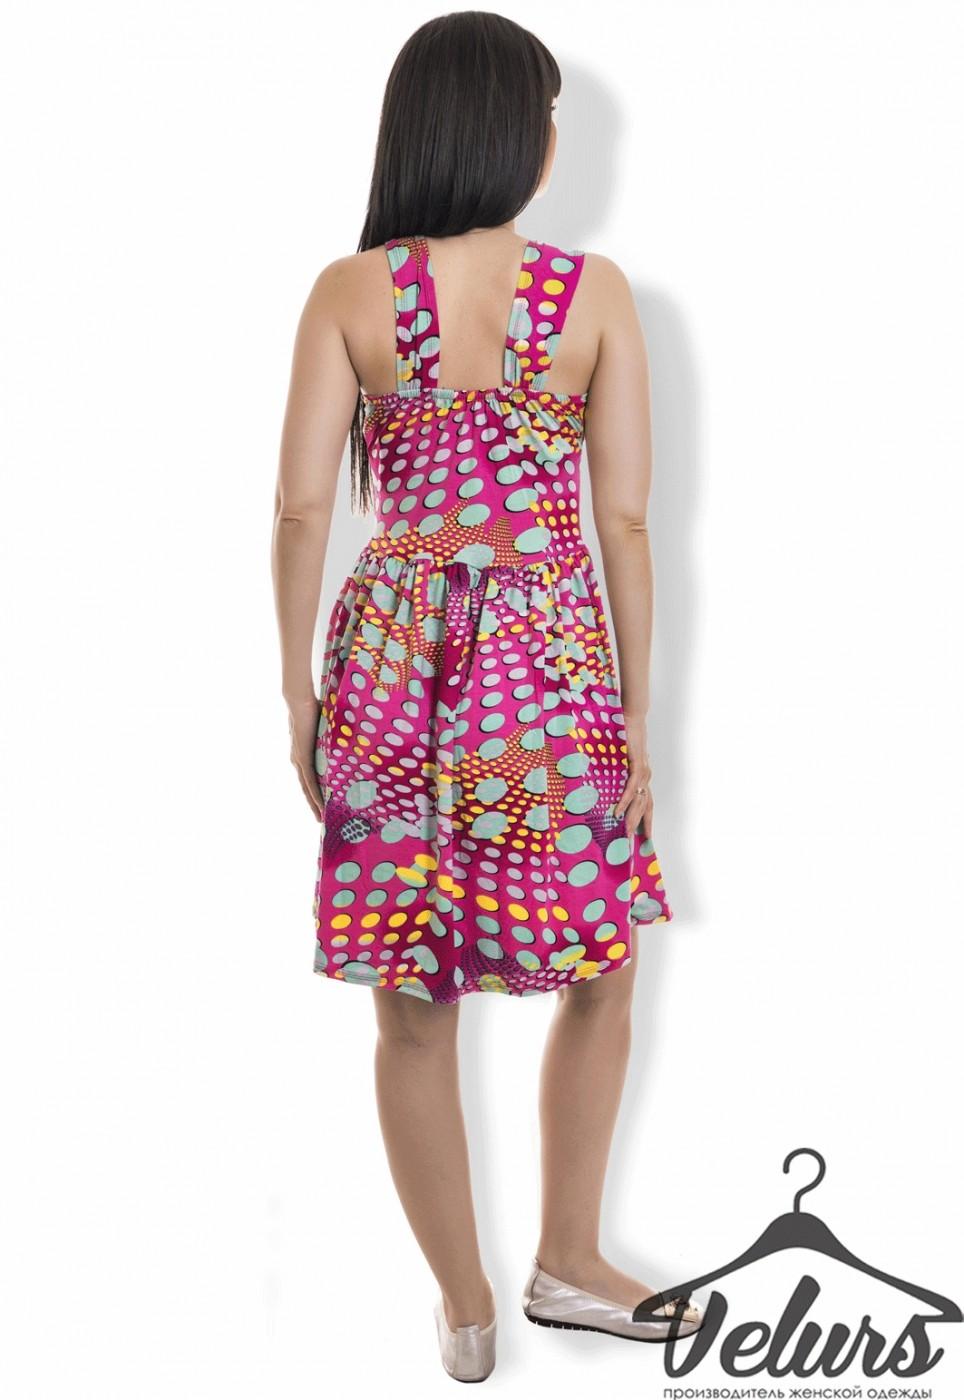 Velurs: Платье 21962 - фото 9